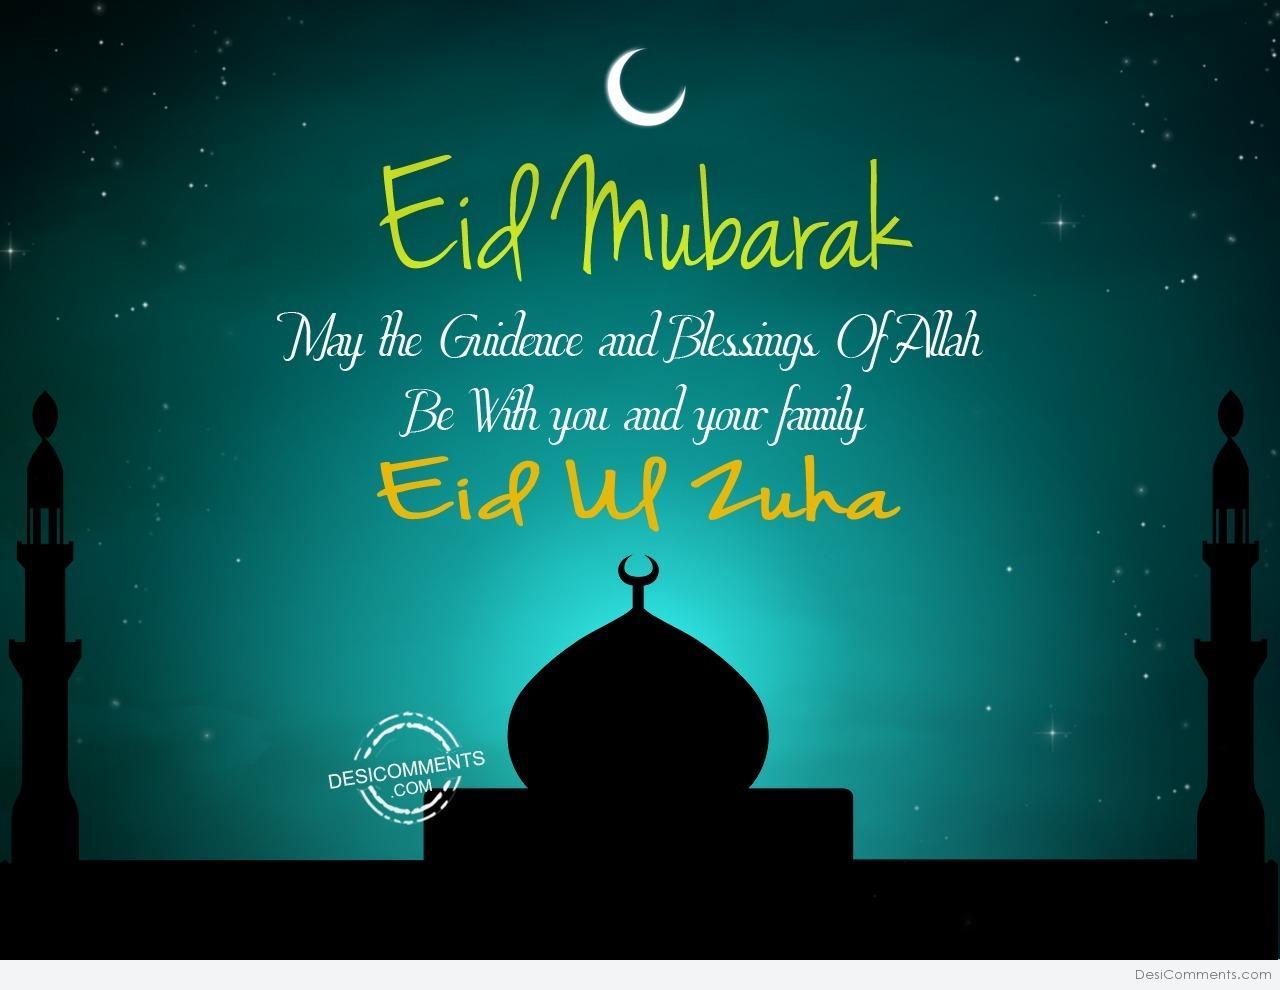 Eid mubarak wishes images latest collection eid mubarak 2017 eid mubarak wishes images 2017 kristyandbryce Images